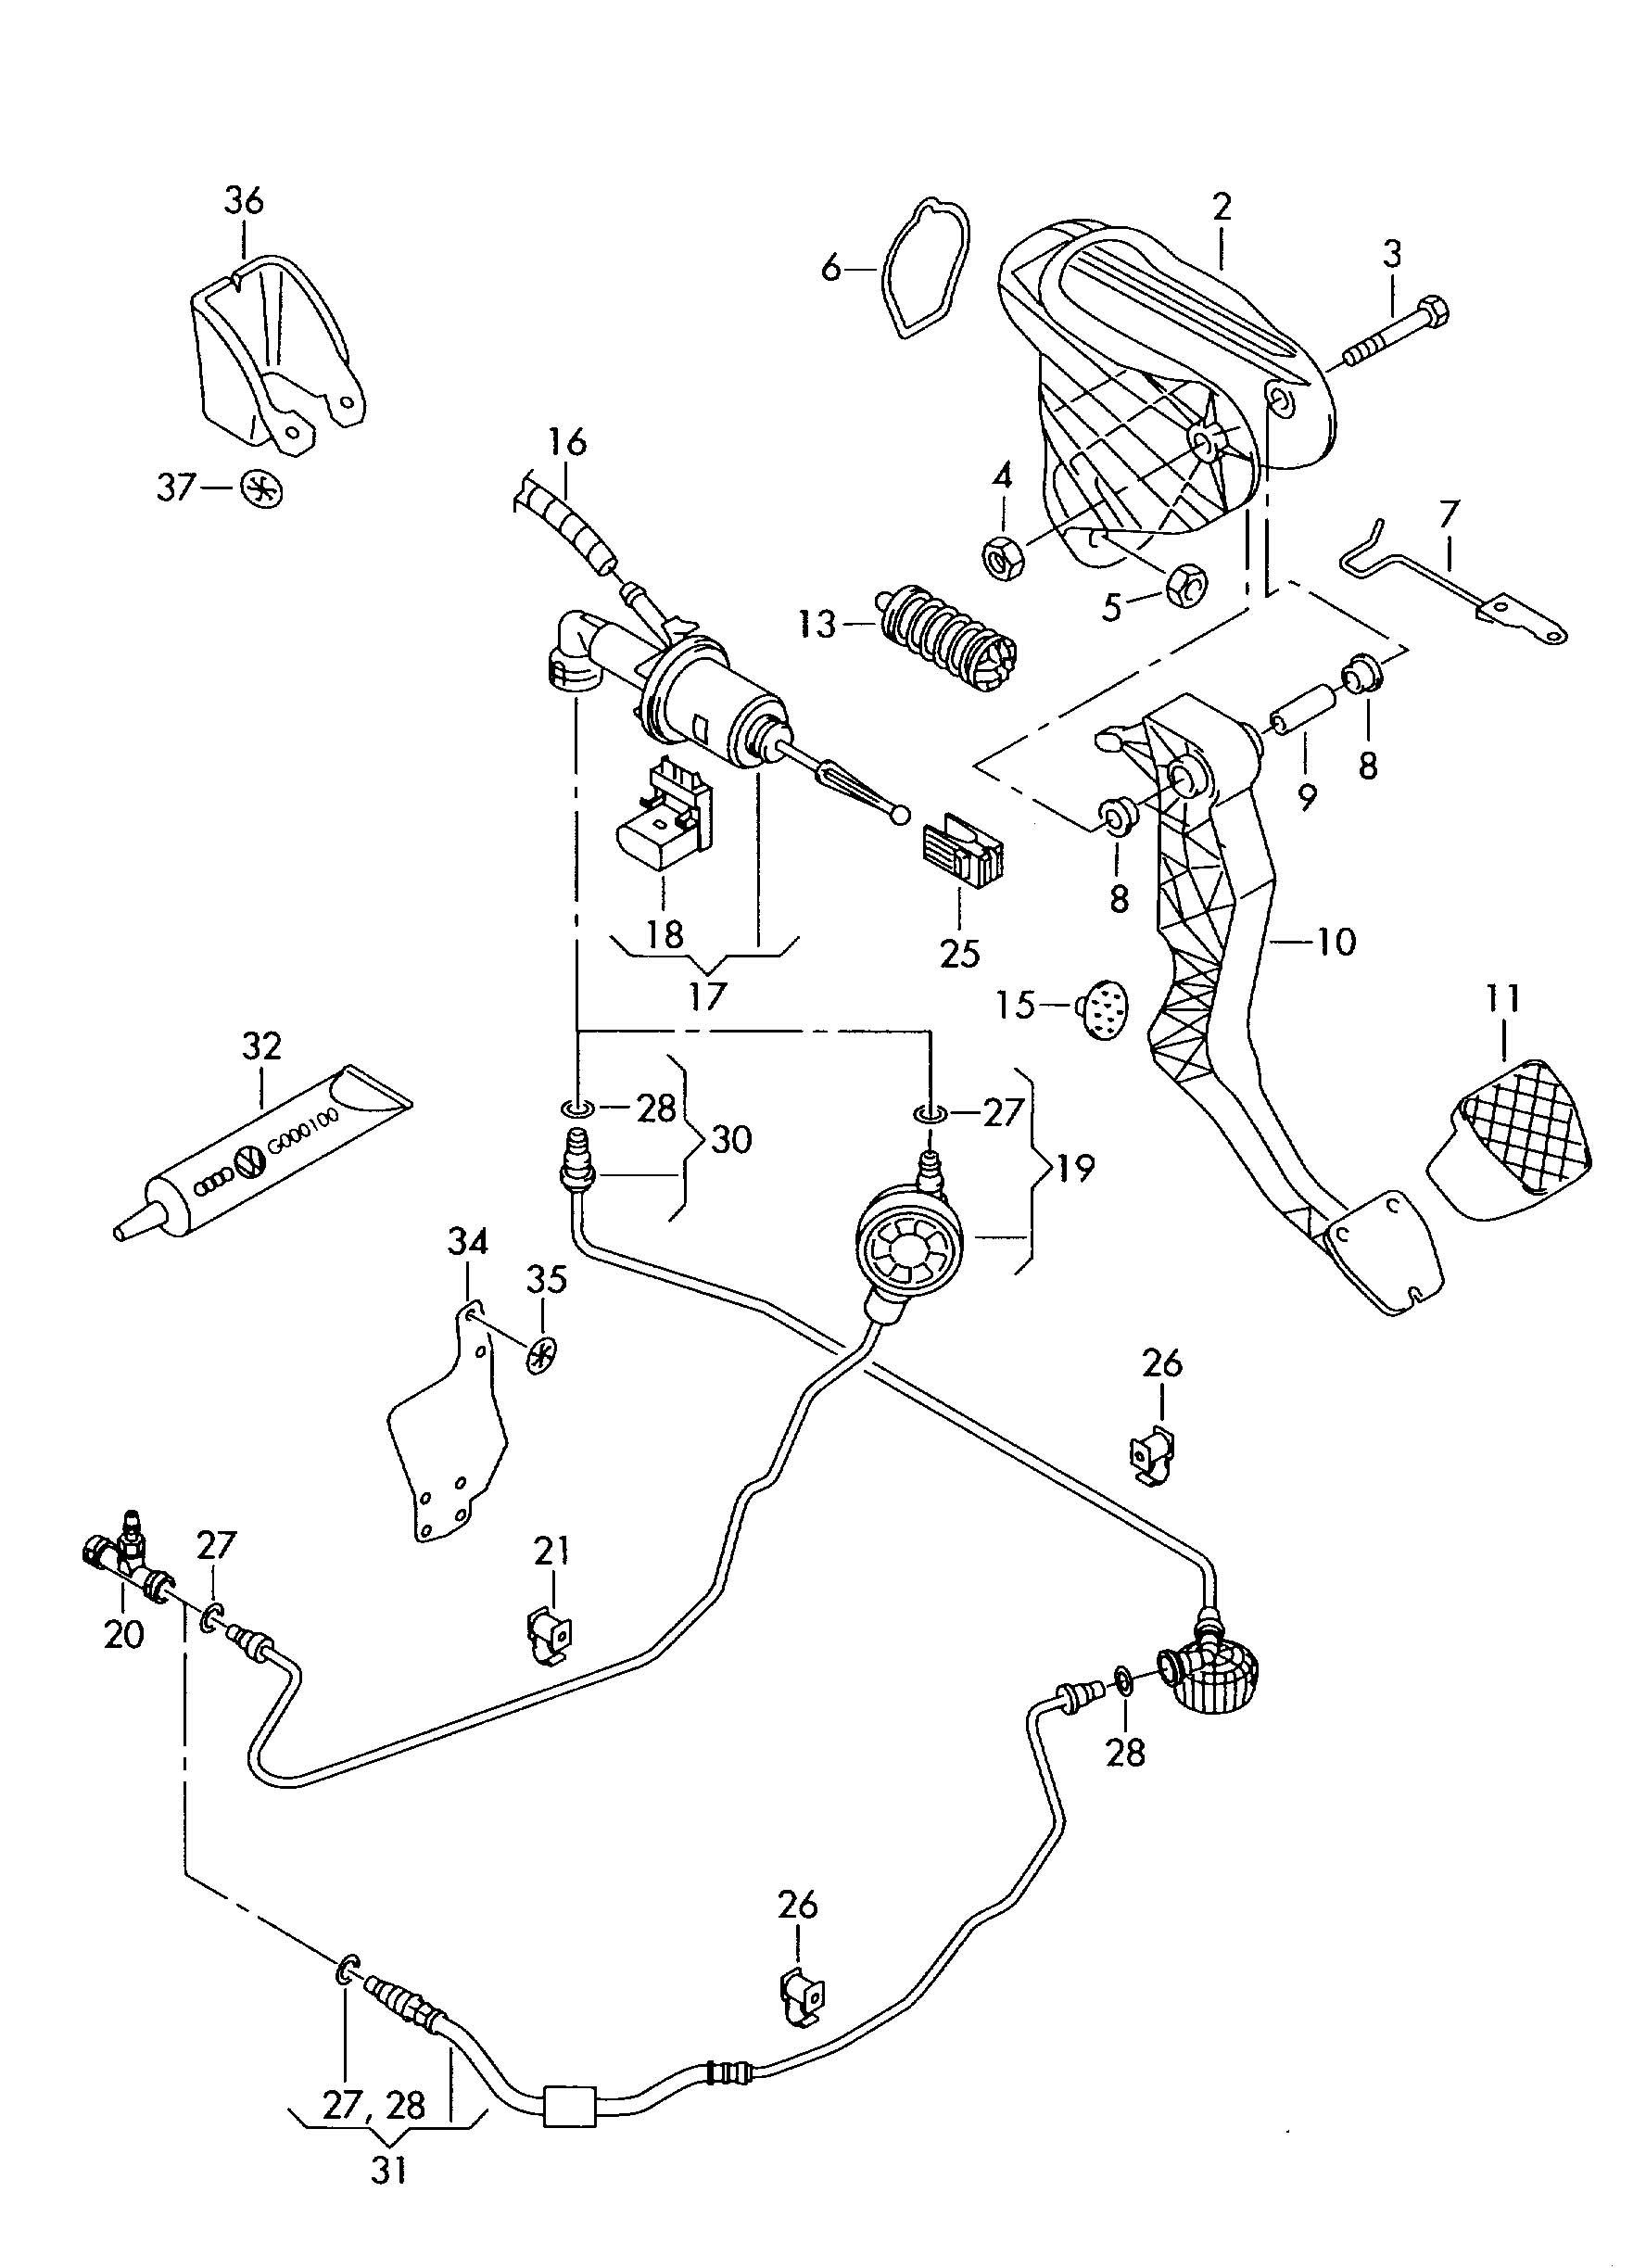 94 vw jetta parts diagram dc circuit breaker wiring 2002 cabrio repair manual imageresizertool com